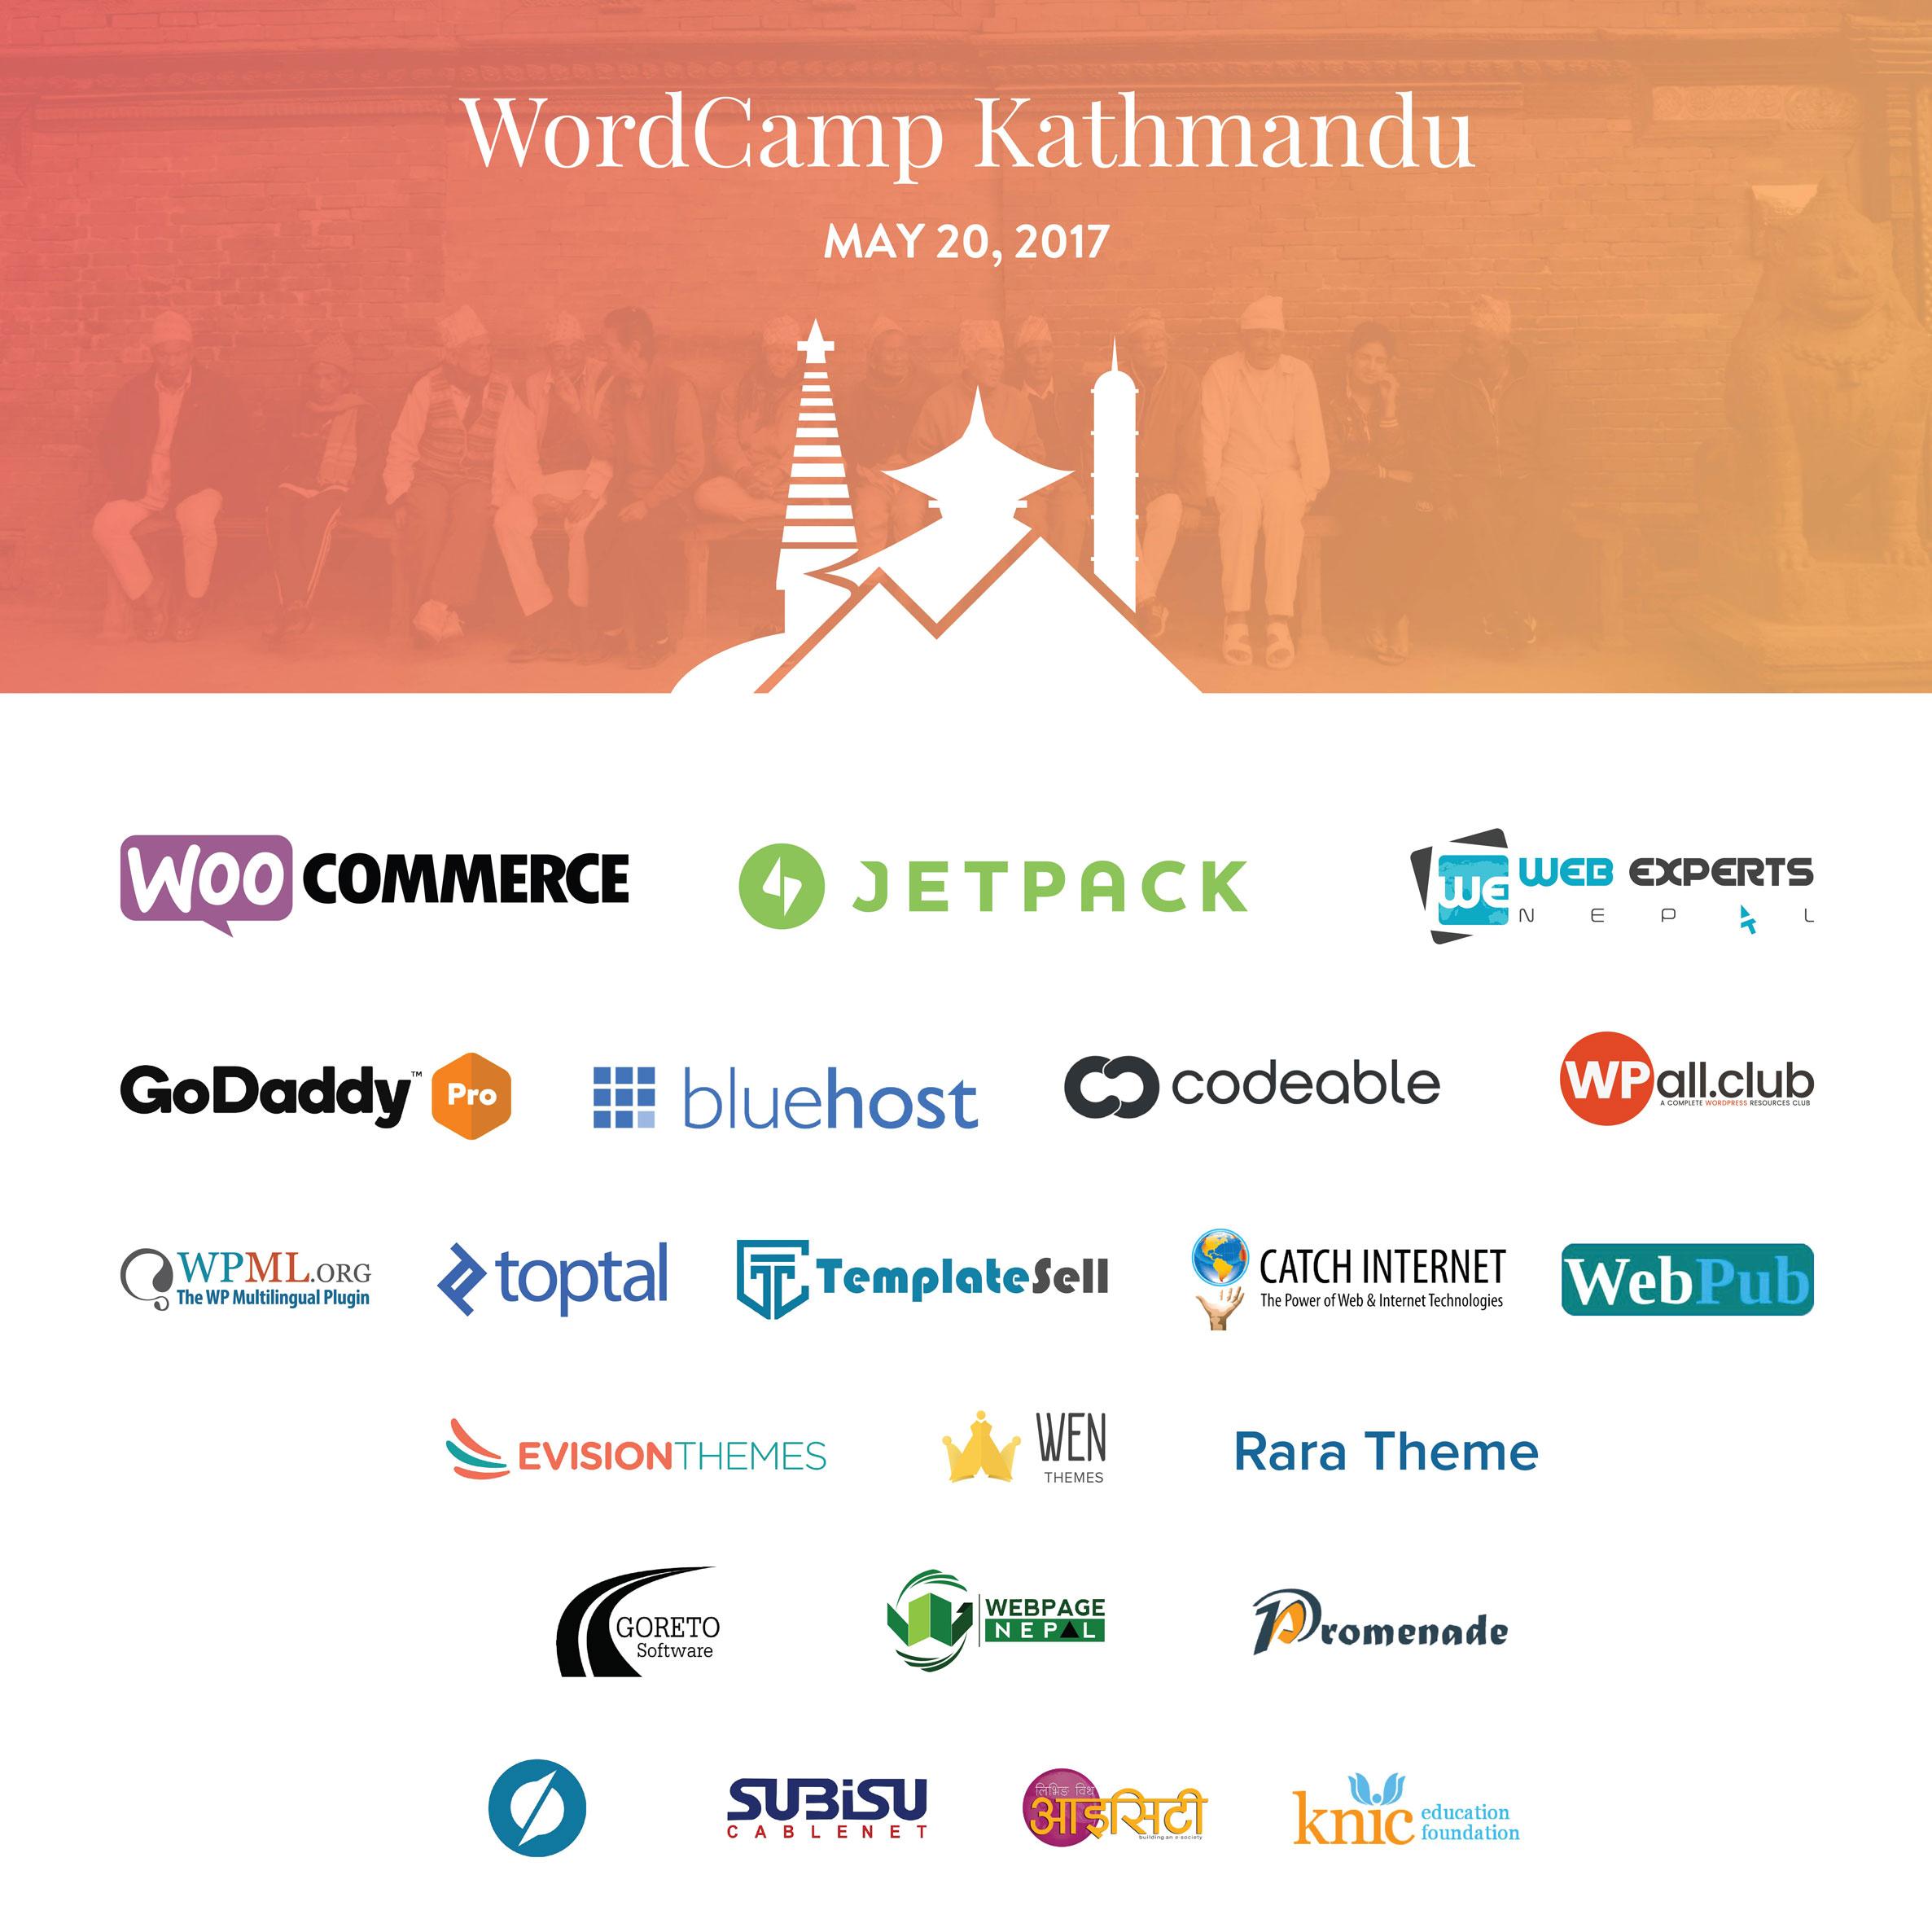 WordCamp Kathmandu 2017 Sponsors